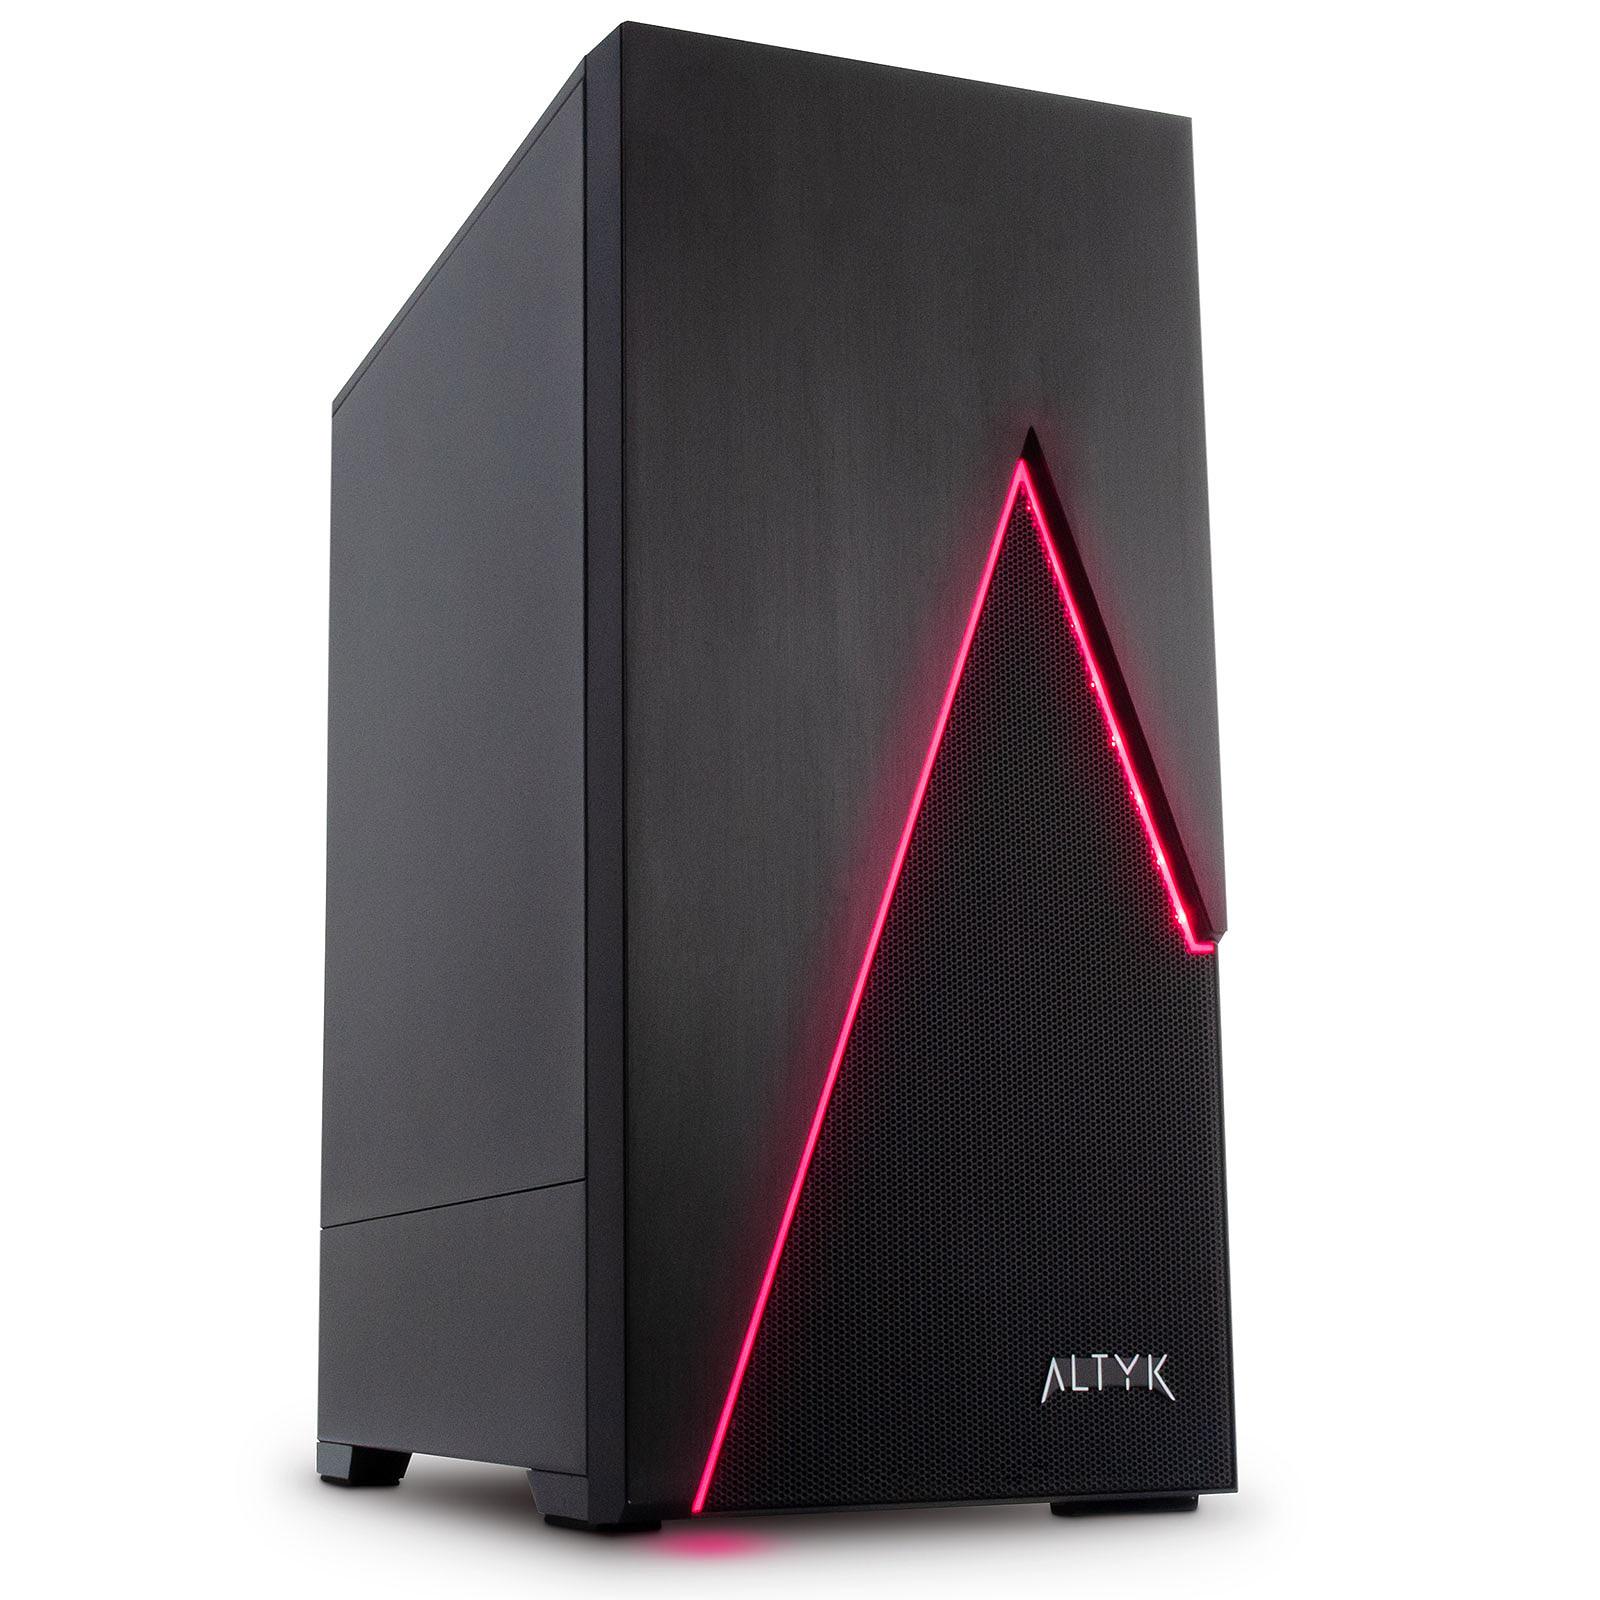 Altyk Le Grand PC Entreprise P1-I516-S05